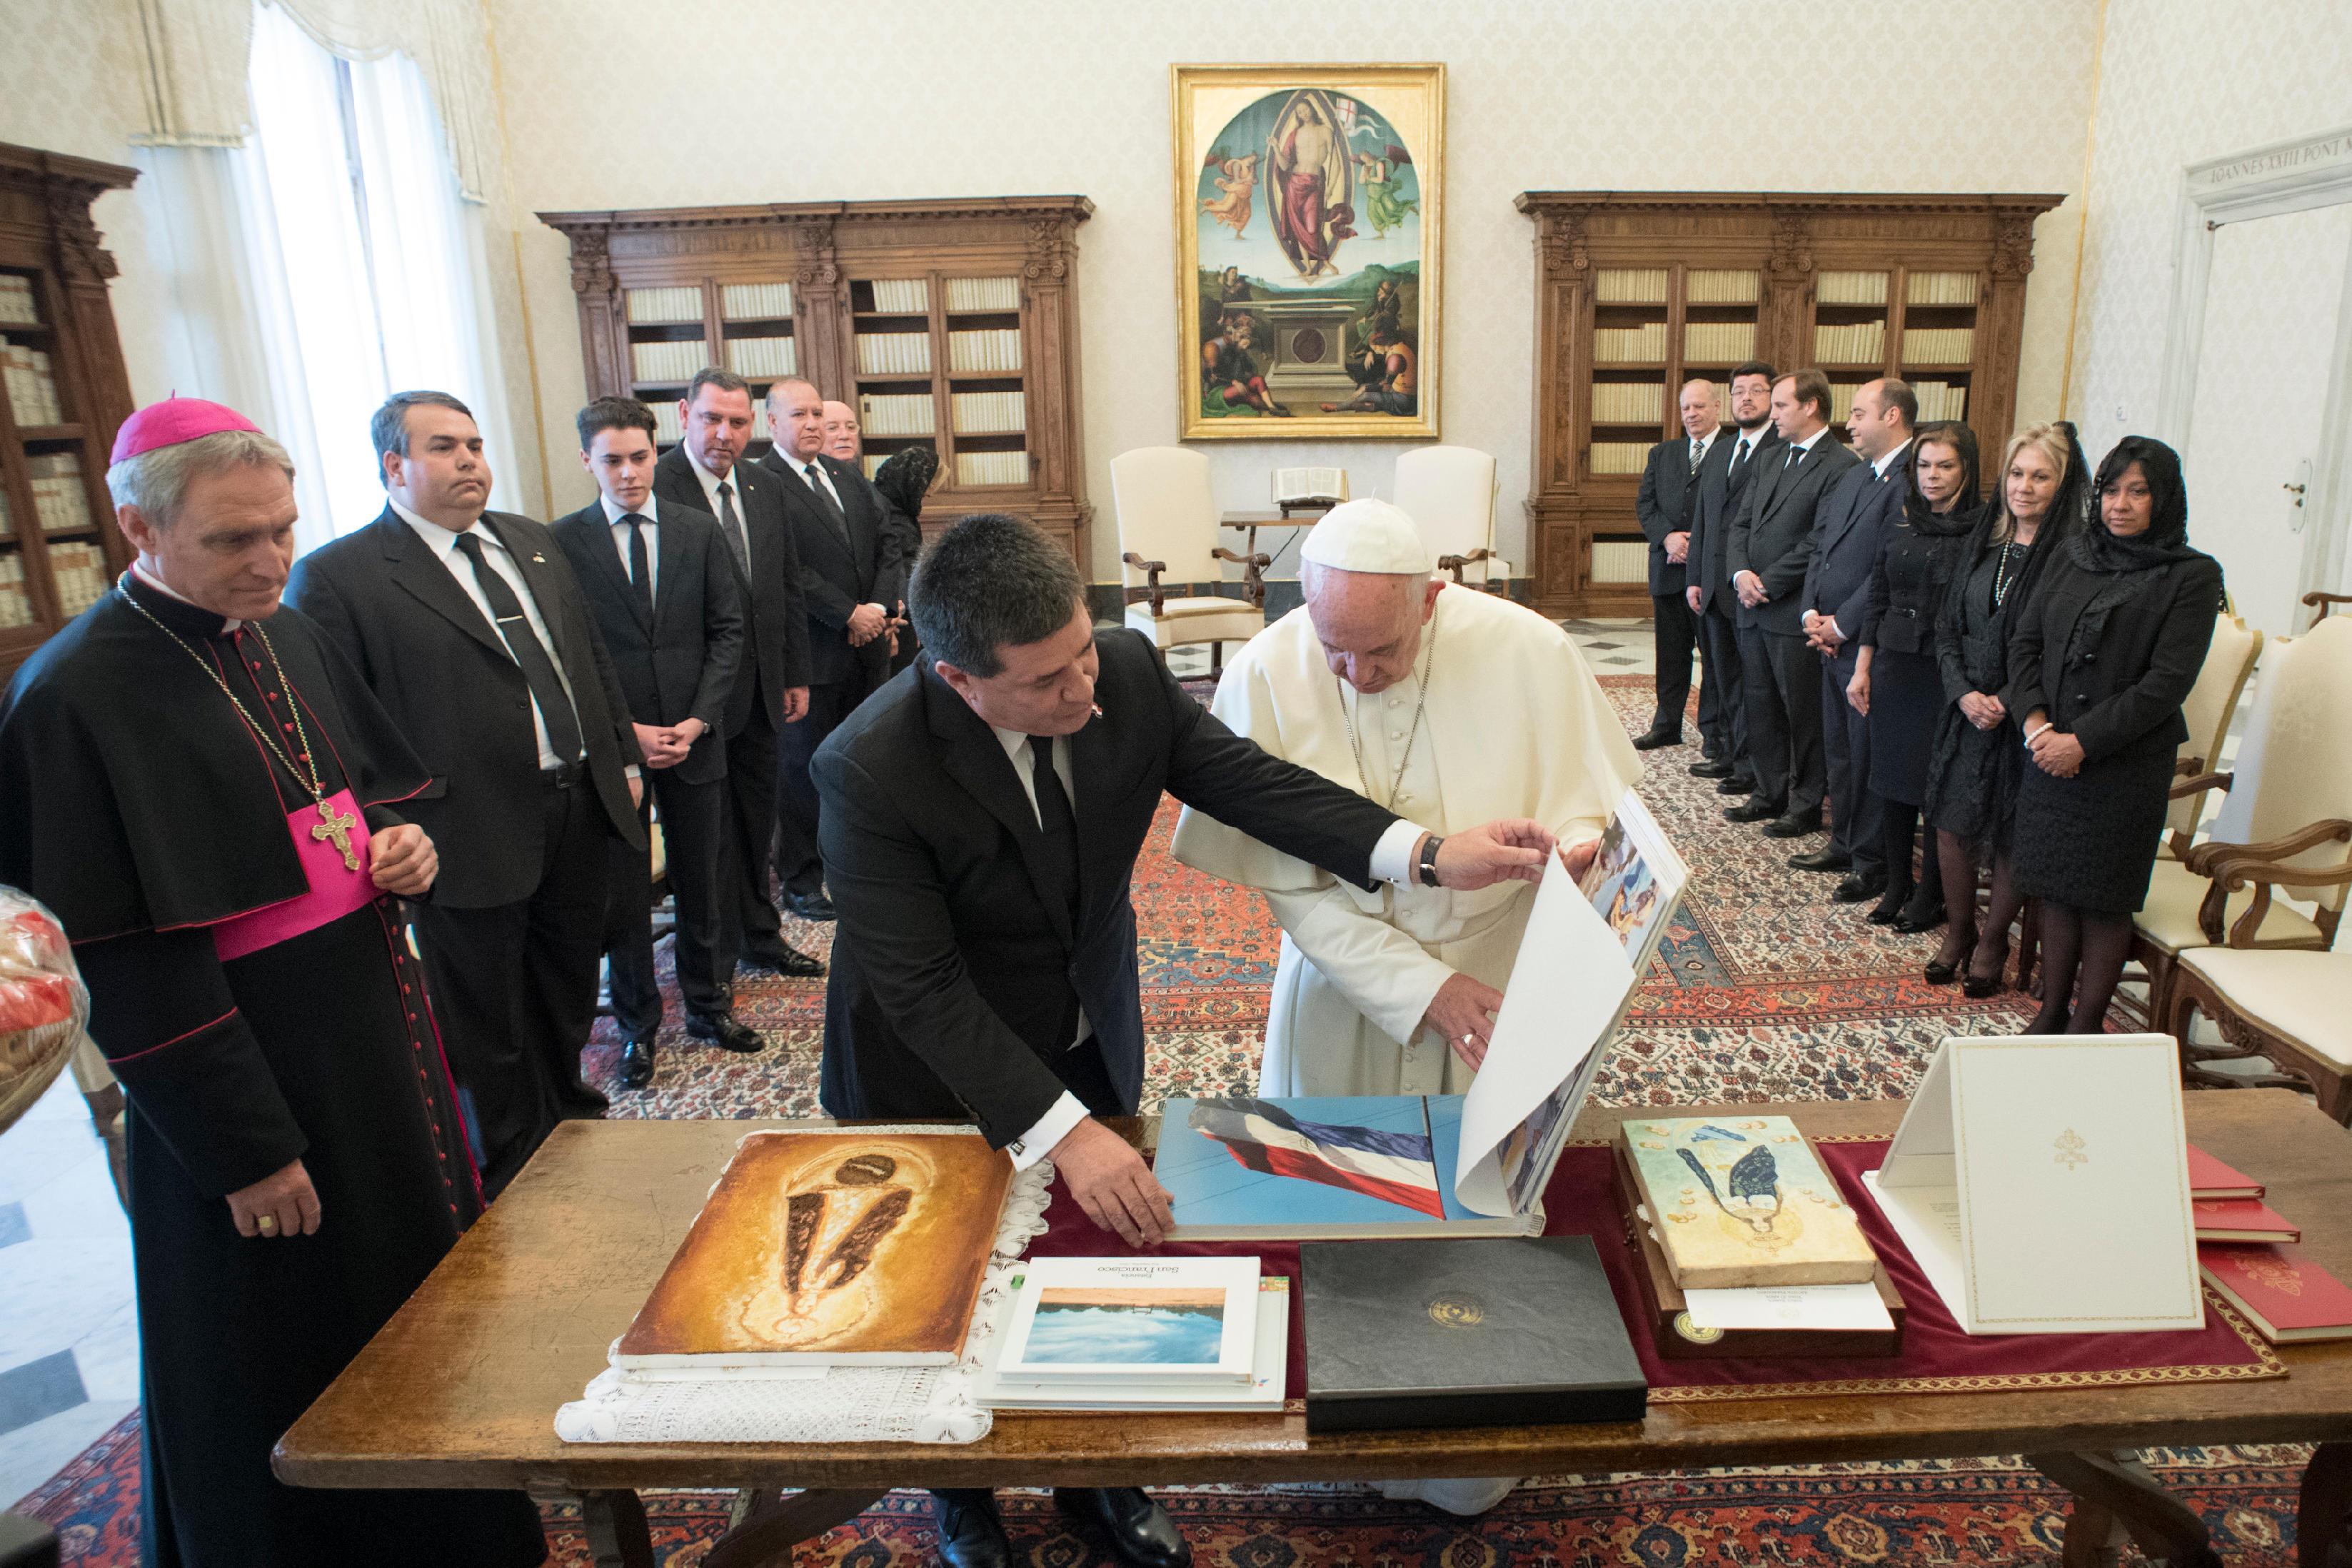 Président Horacio Cartes (Paraguay) 09/11/2017 © L'Osservatore Romano